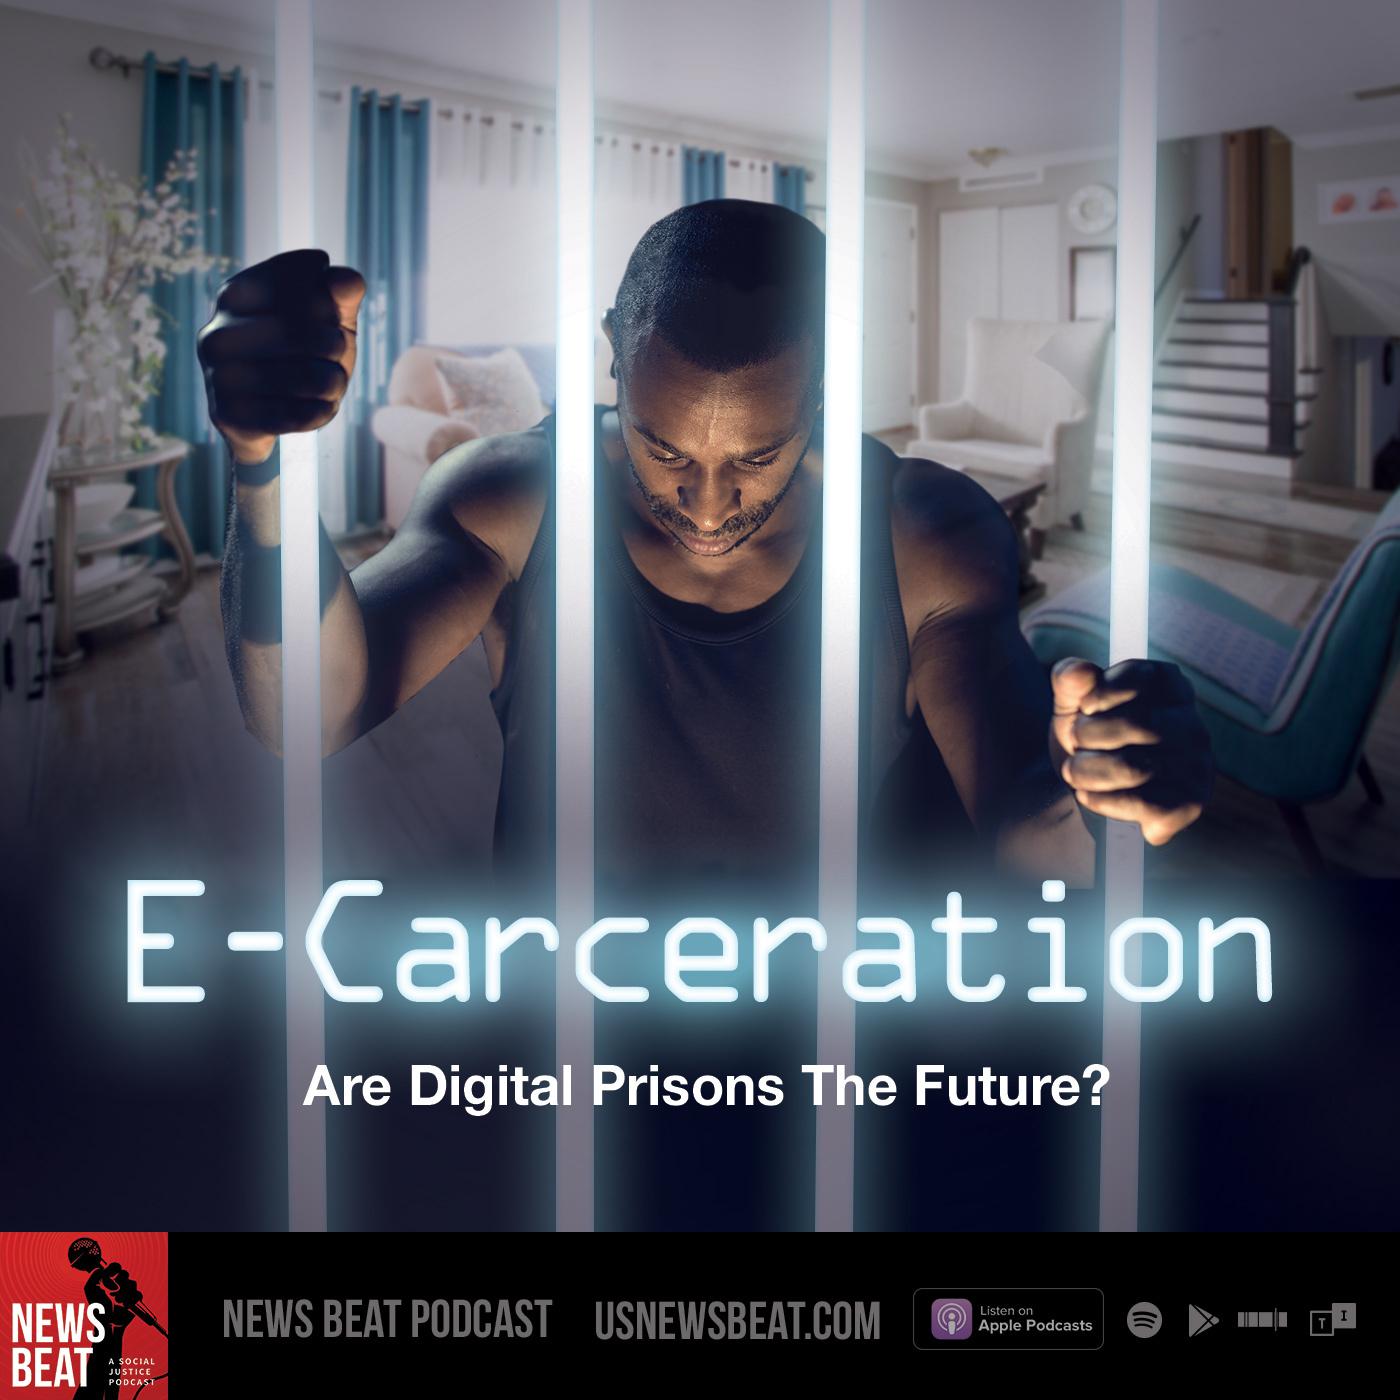 E-Carceration